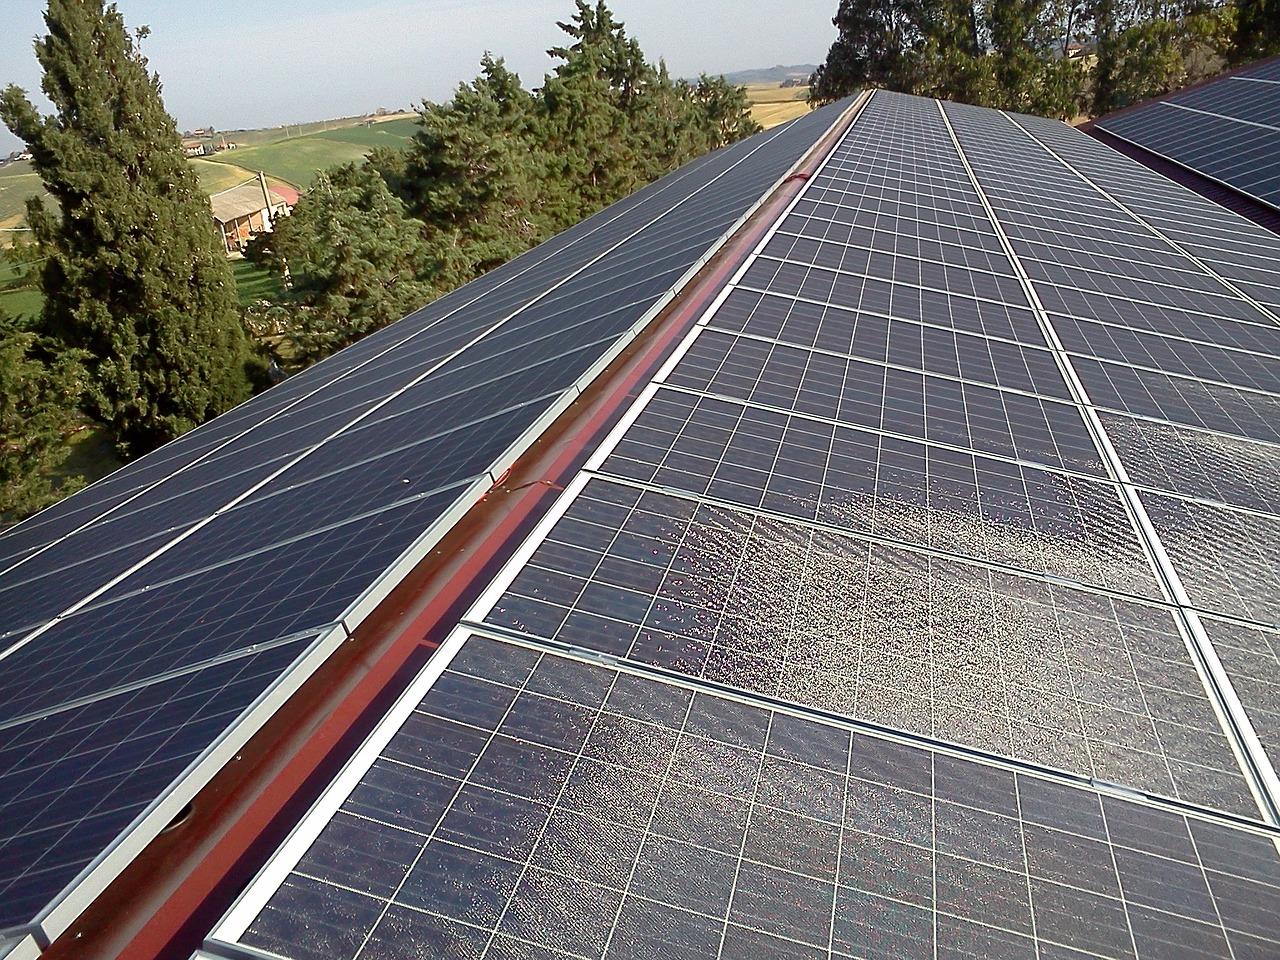 Inwertery ongrid, inwertery solarne